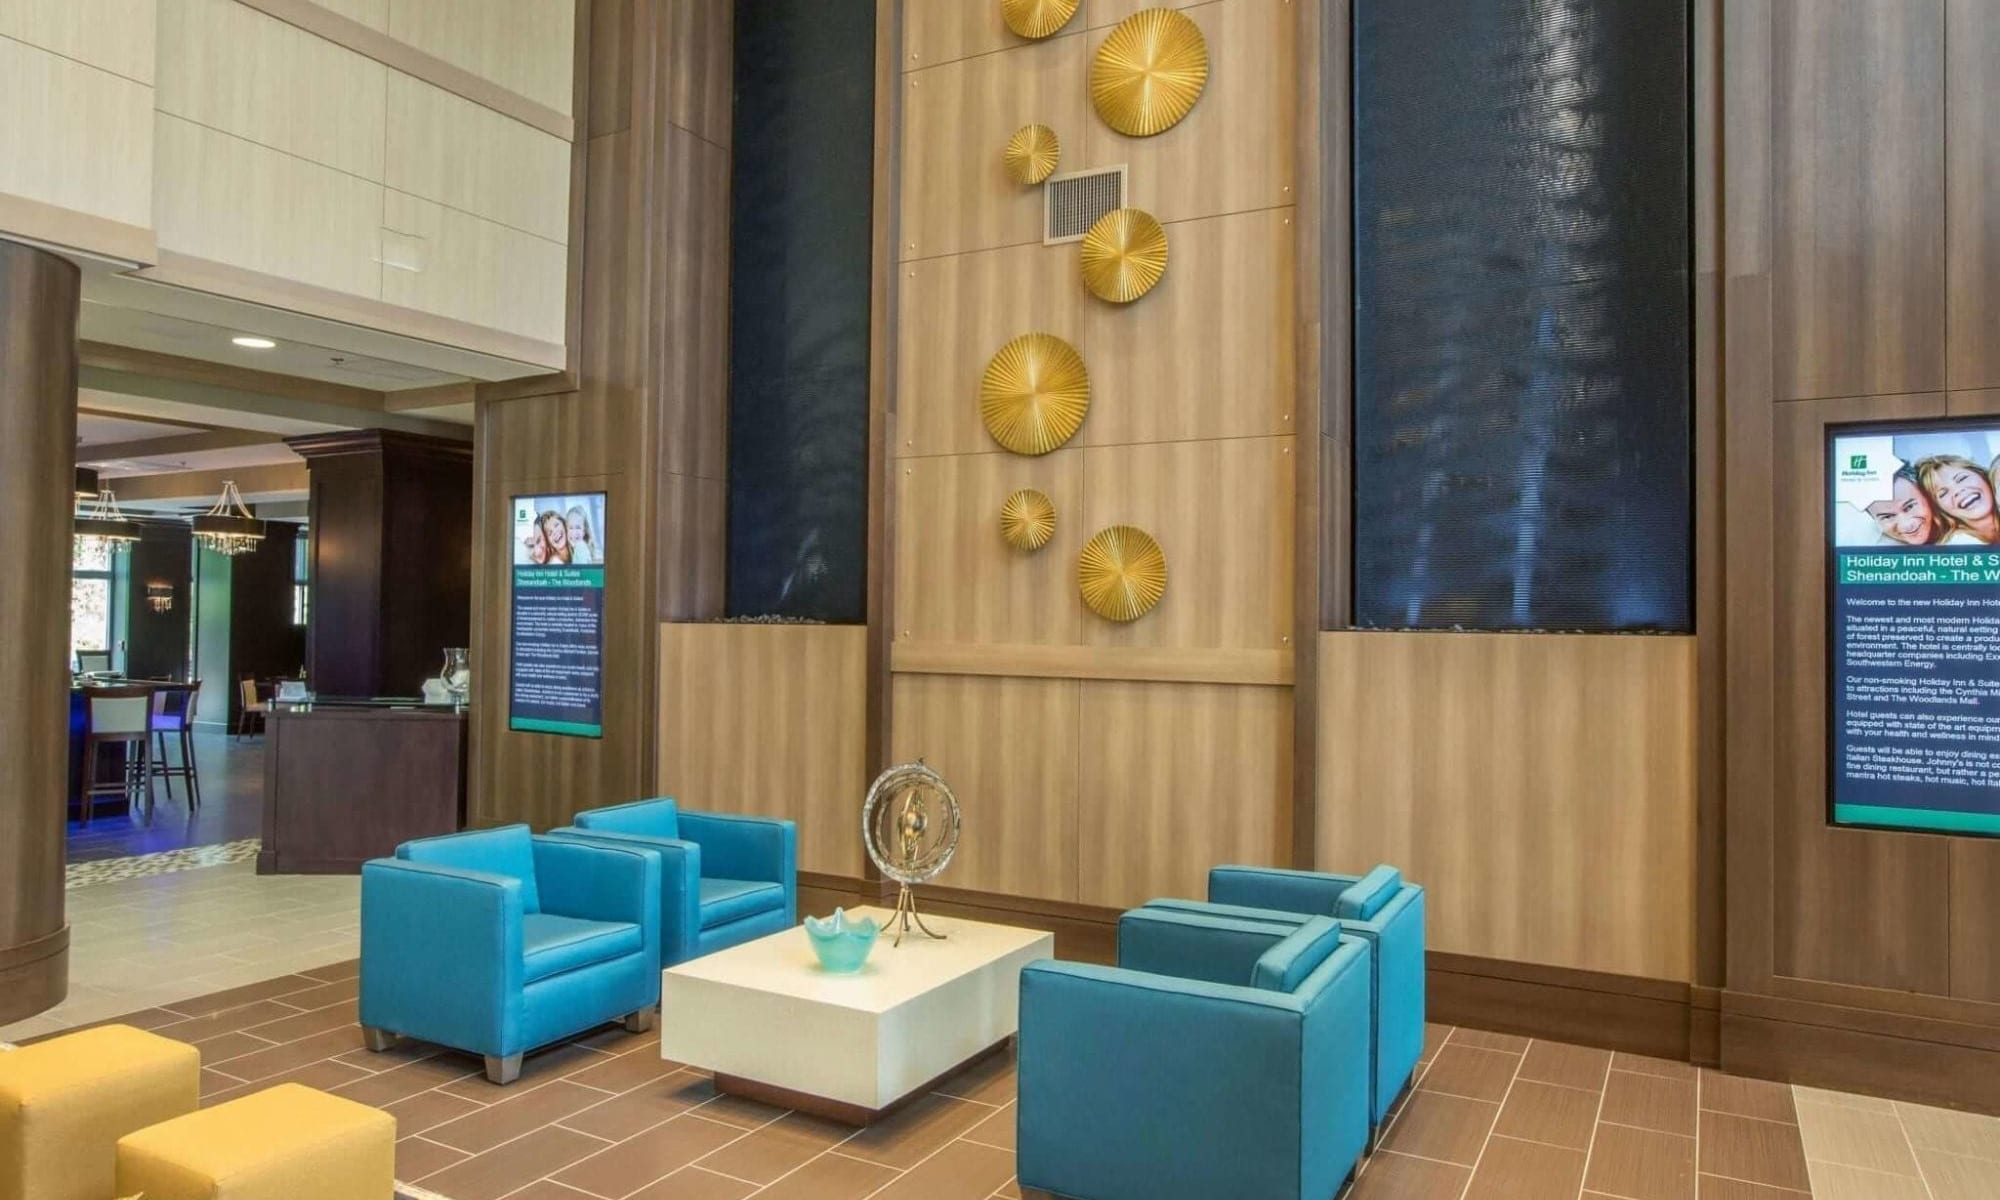 Holiday Inn Shenandoah Texas0A